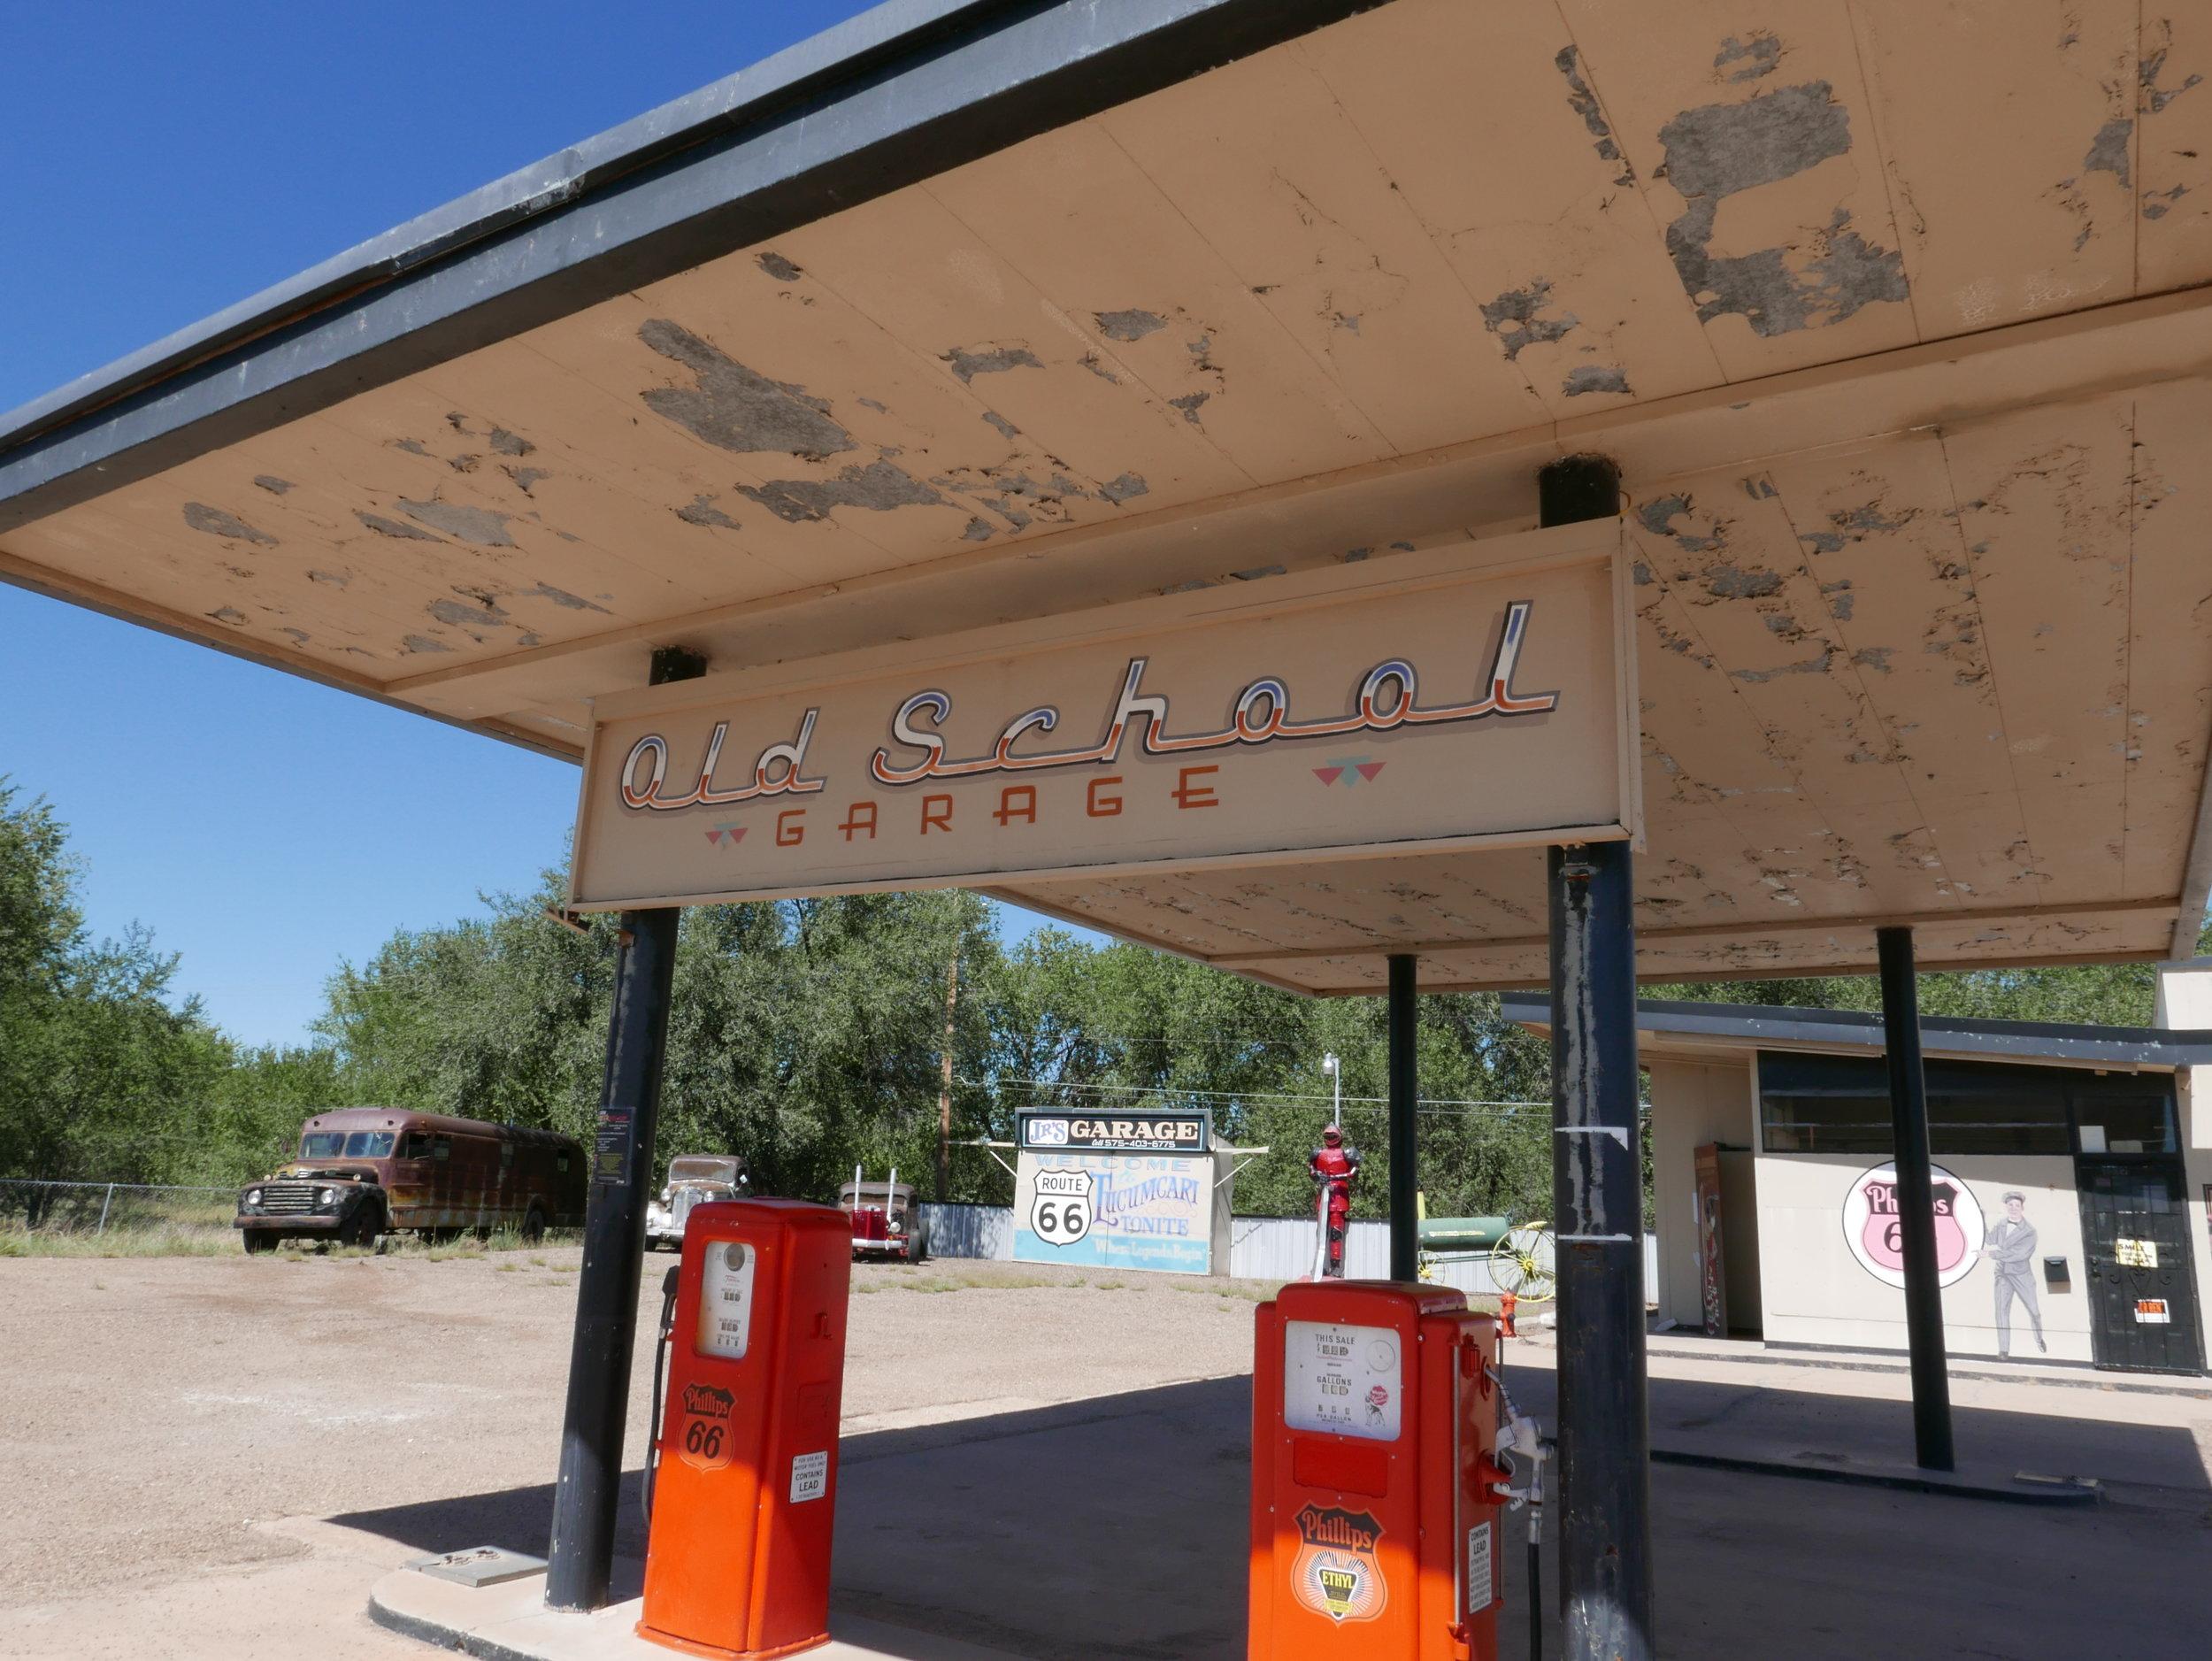 Tucumcari, New Mexico-- Rt 66